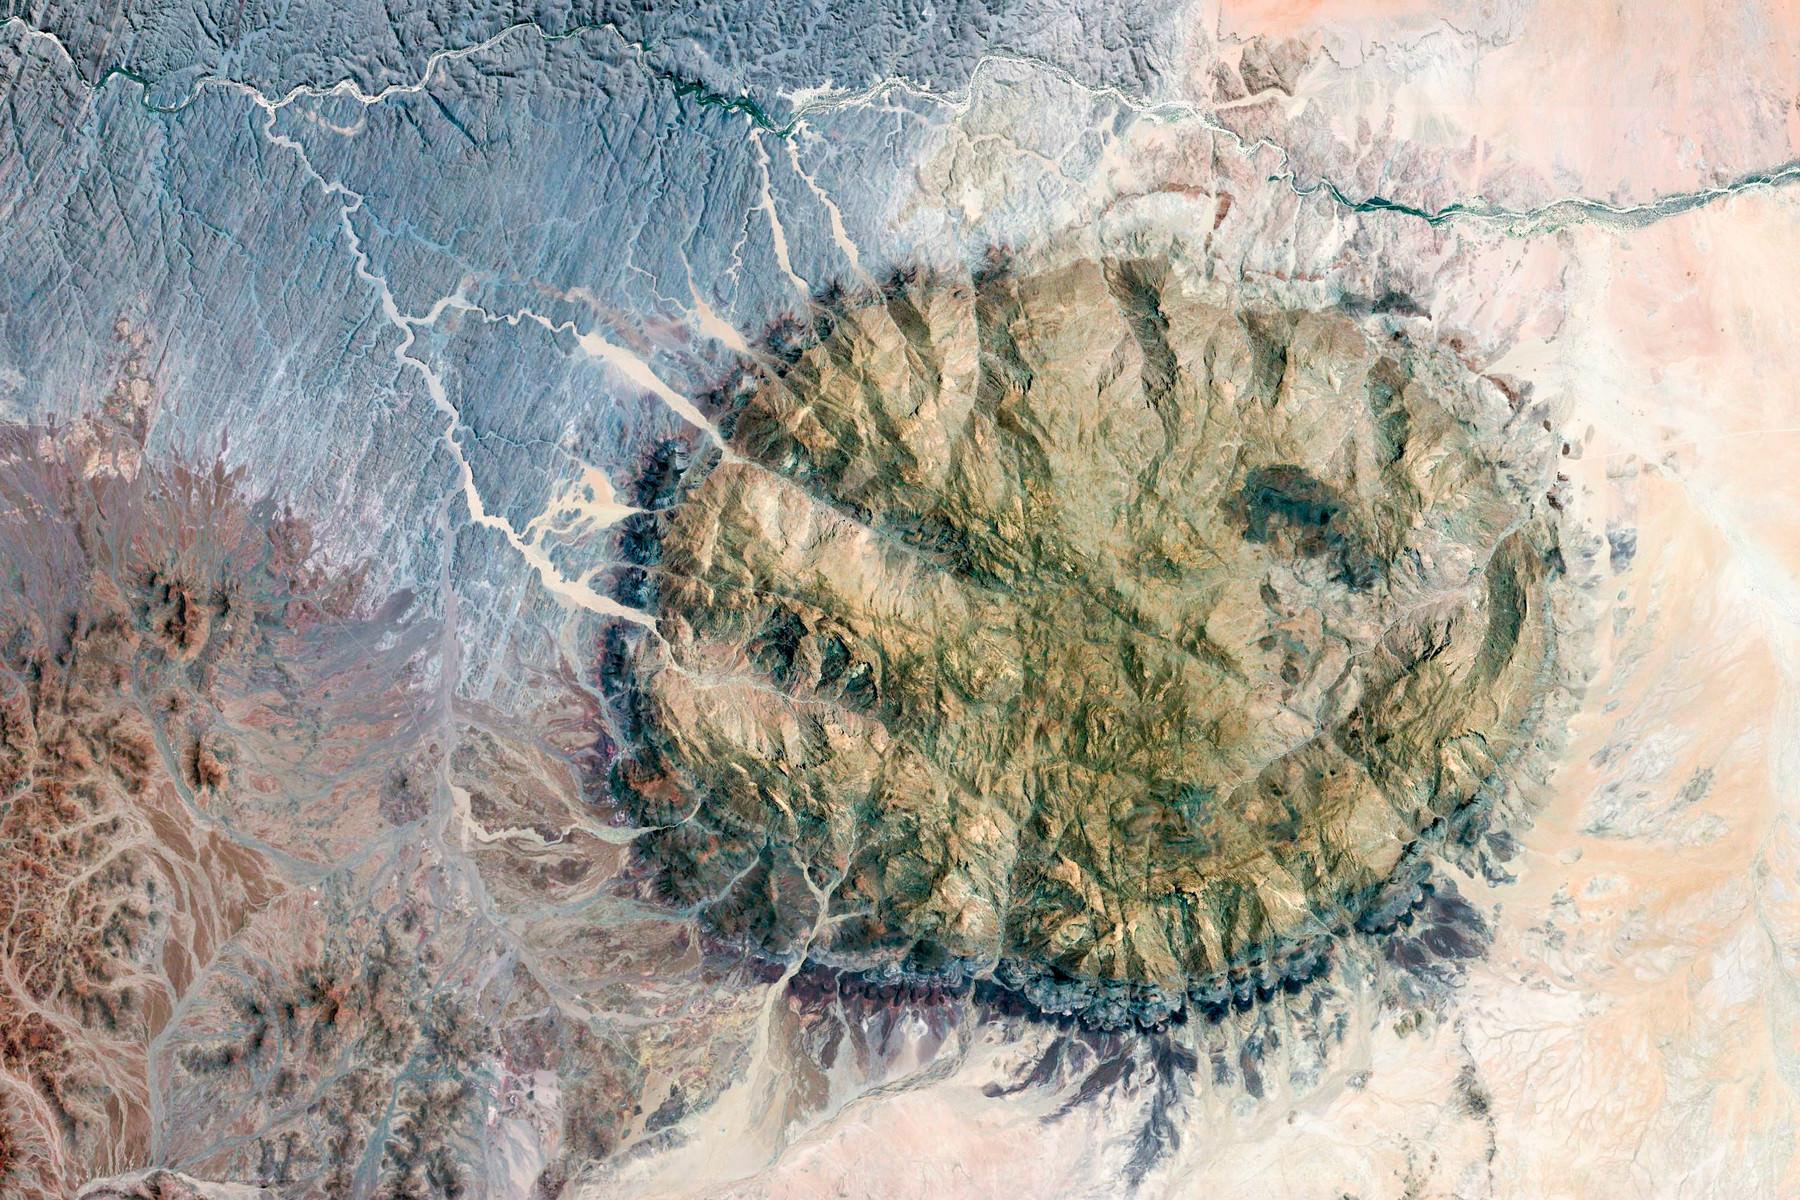 google-earth-Namibia-Erongo-2028